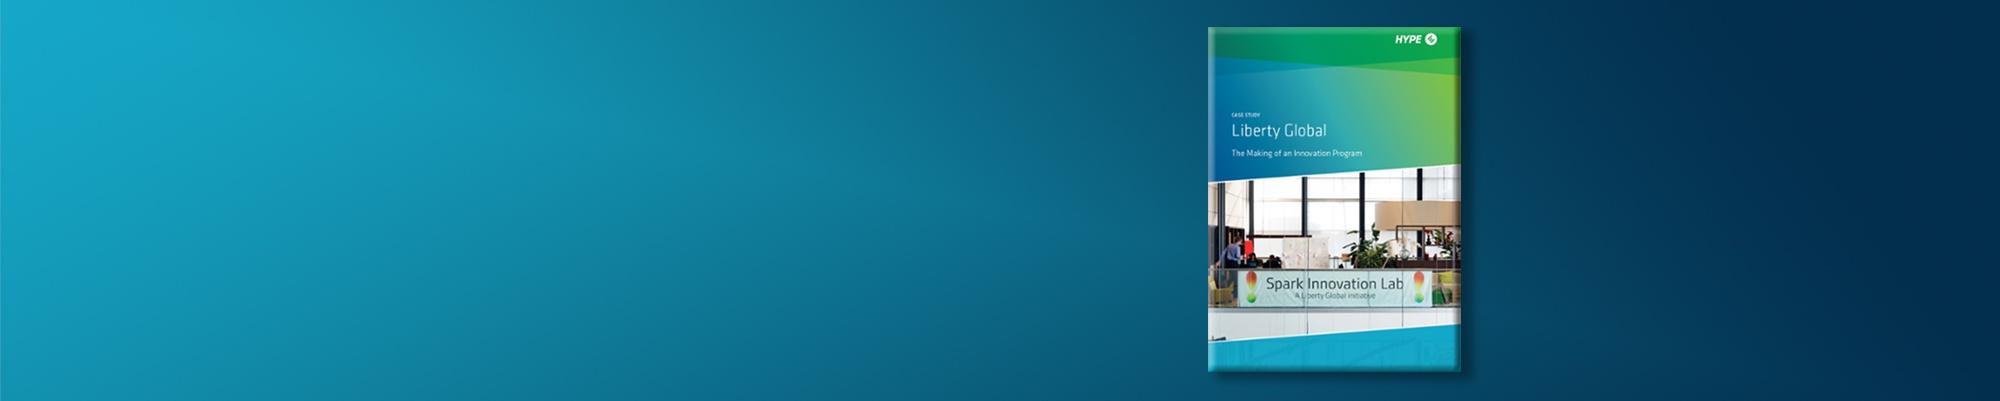 background-lg-casestudy-banner-homepage.jpg